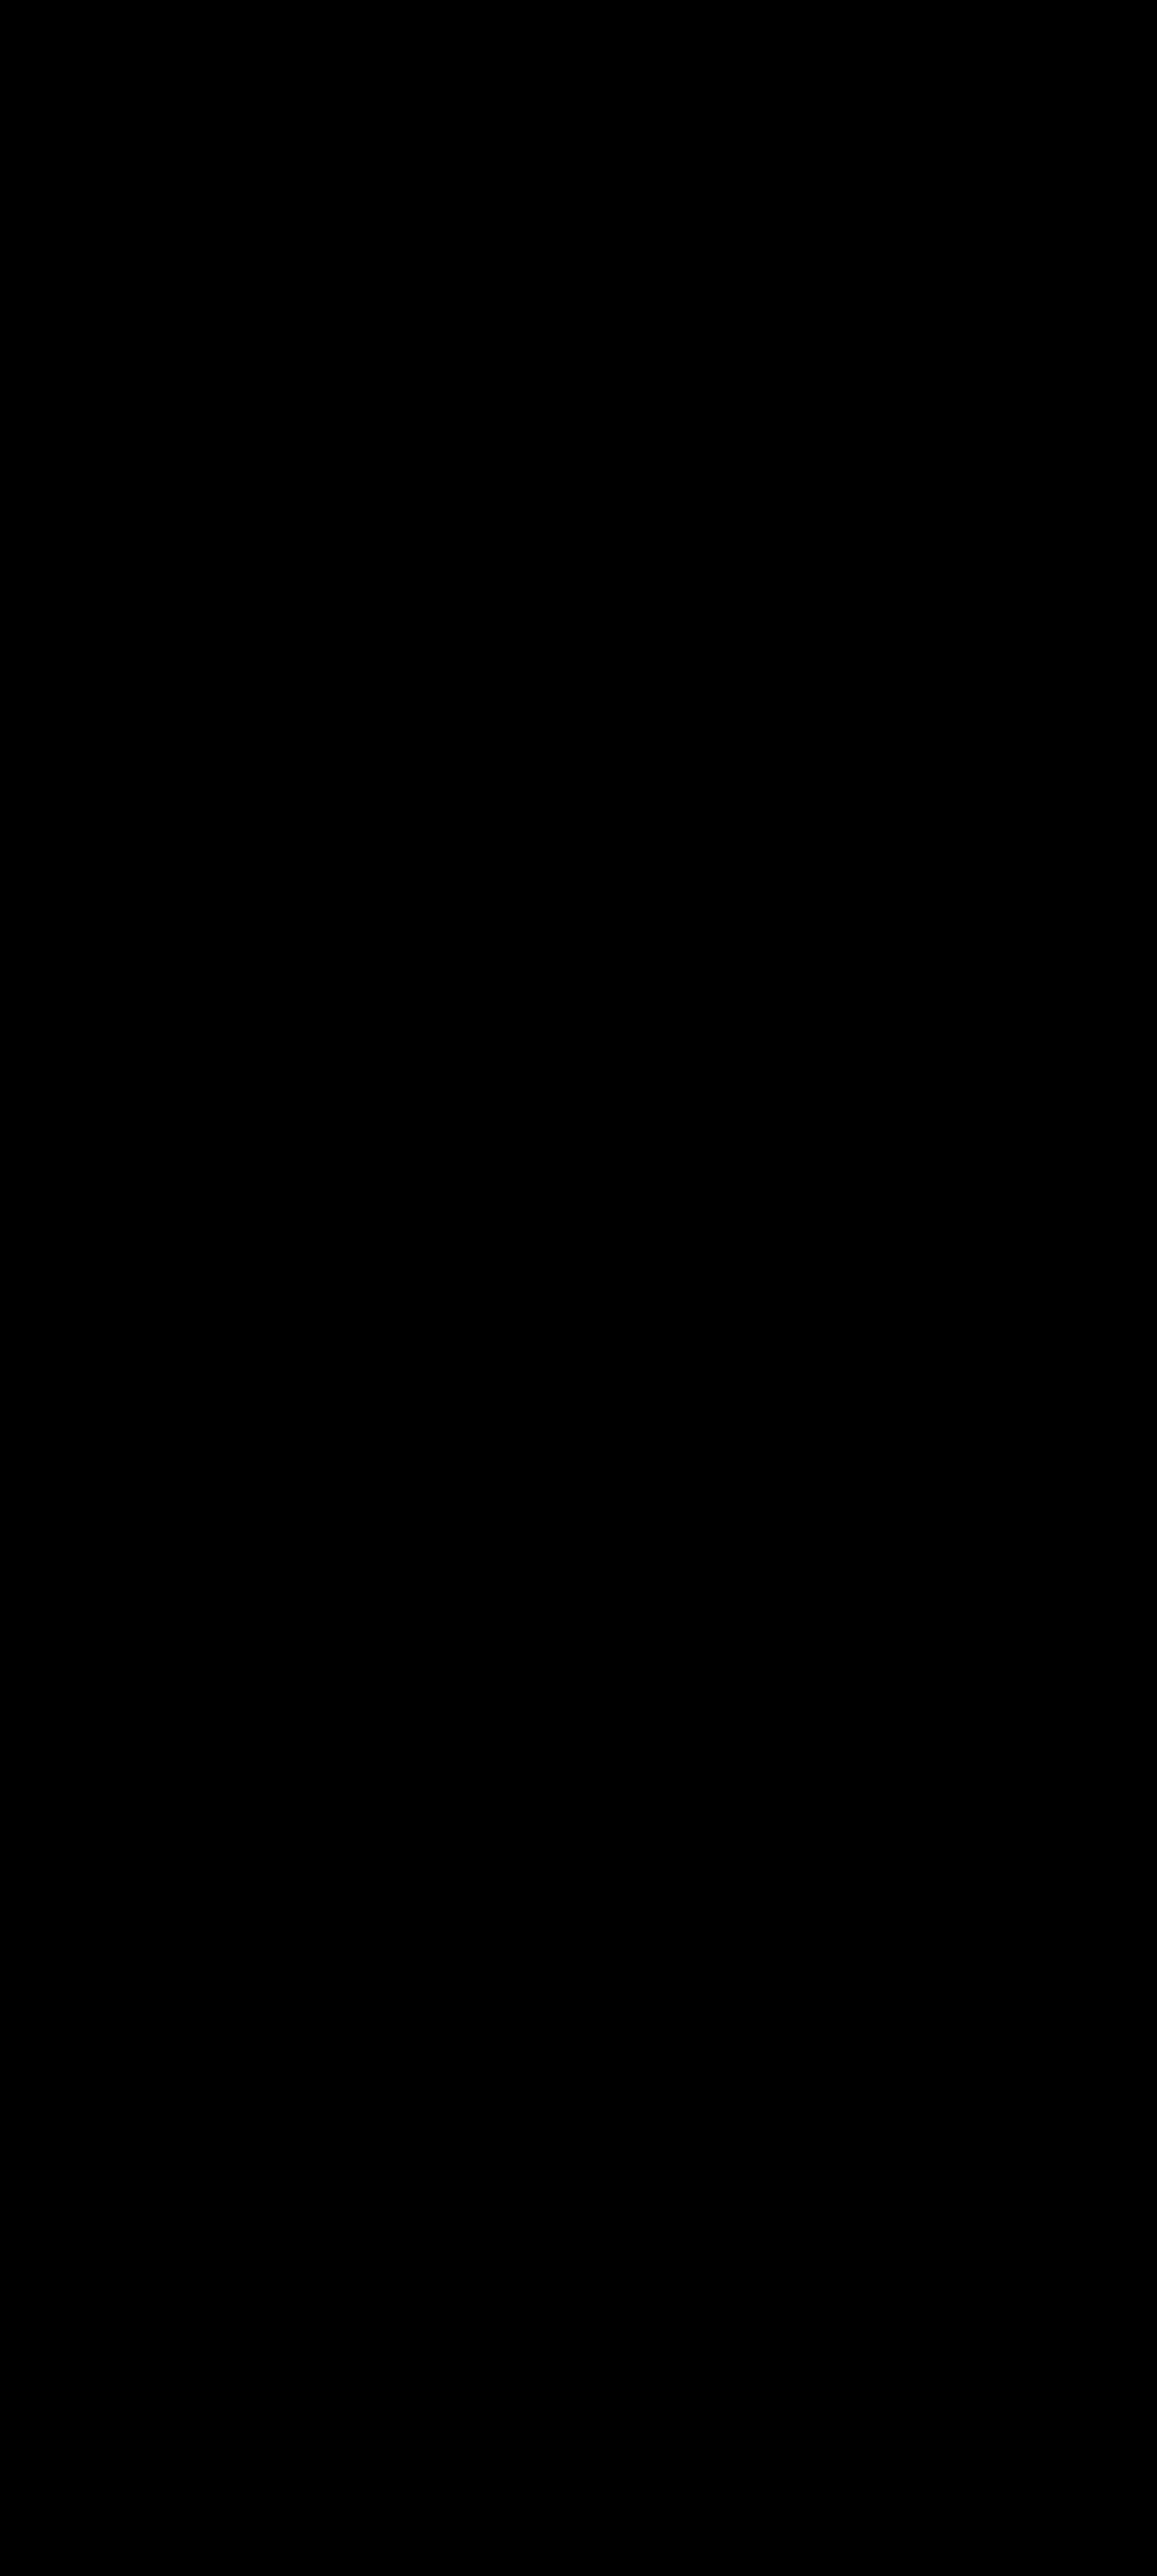 Shortcut for cent symbol choice image symbol and sign ideas cent symbol shortcut gallery symbol and sign ideas cents symbol word image collections symbol design logo buycottarizona